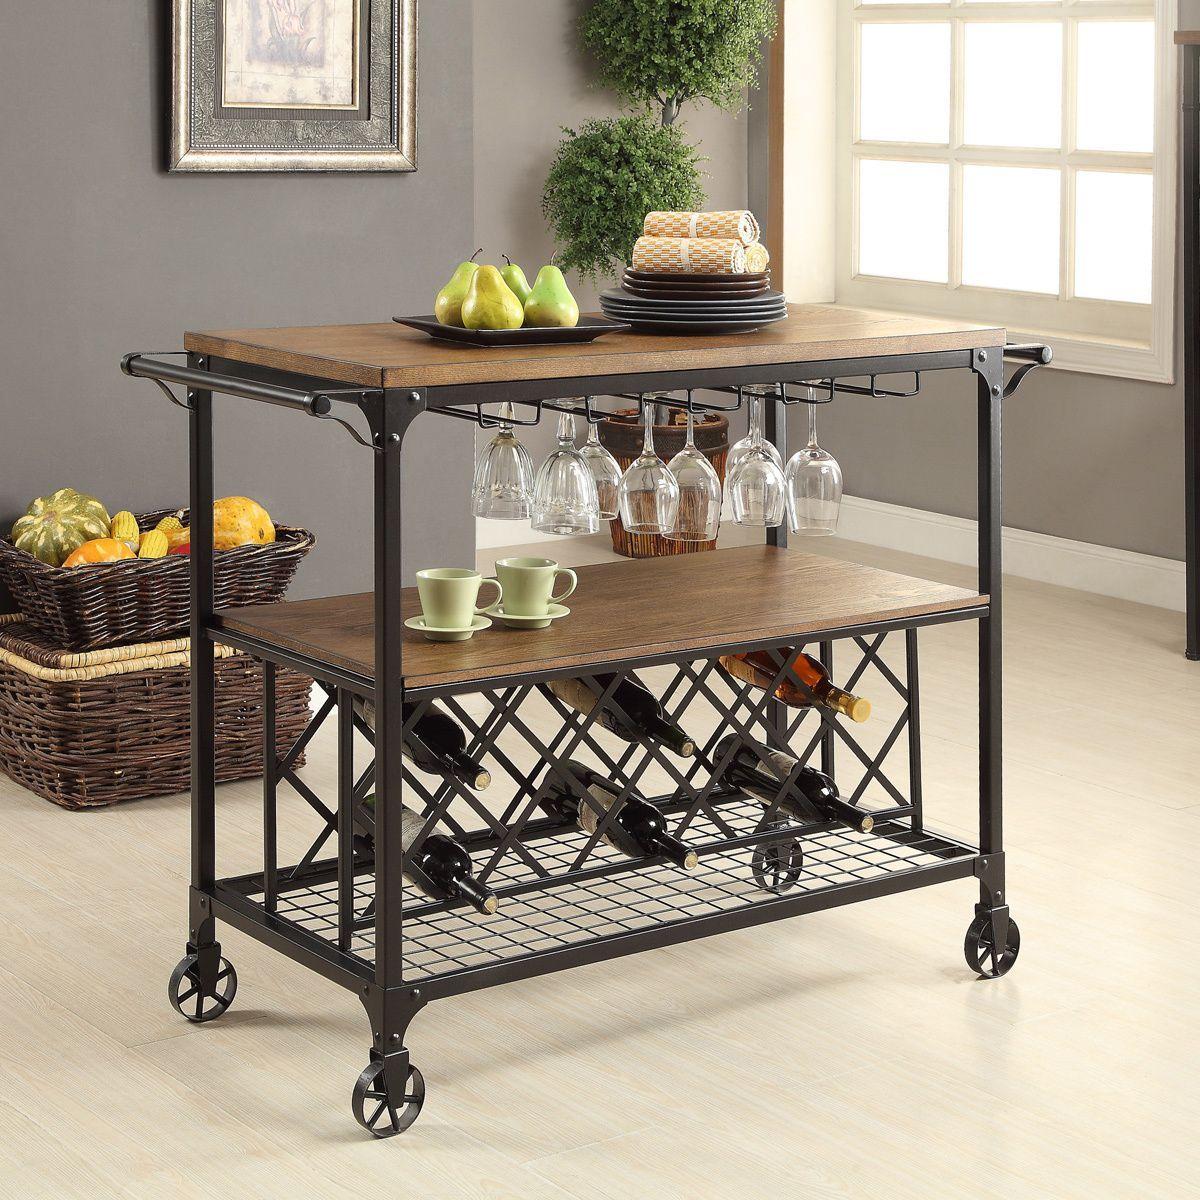 Furniture of america daimon industrial medium oak serving cart by